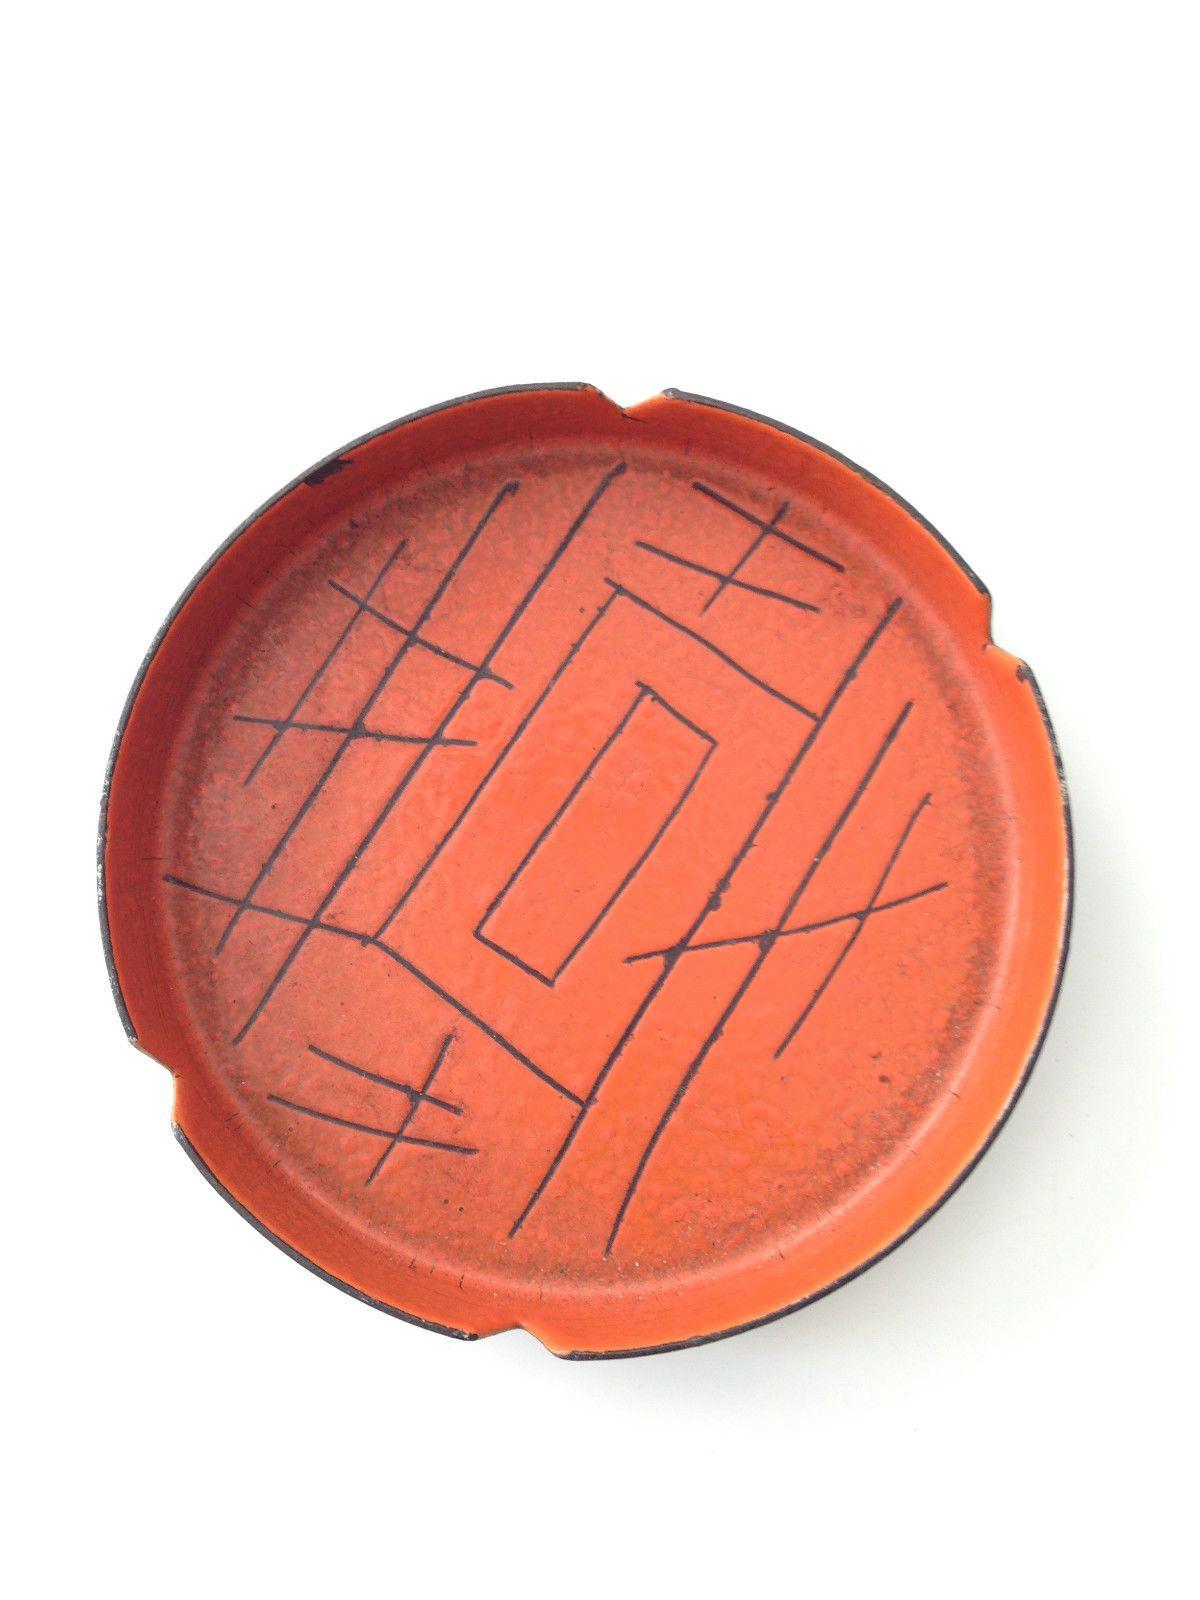 Vintage Vallenit italy enamel DISH ashtray mid century Eames danish modern Era